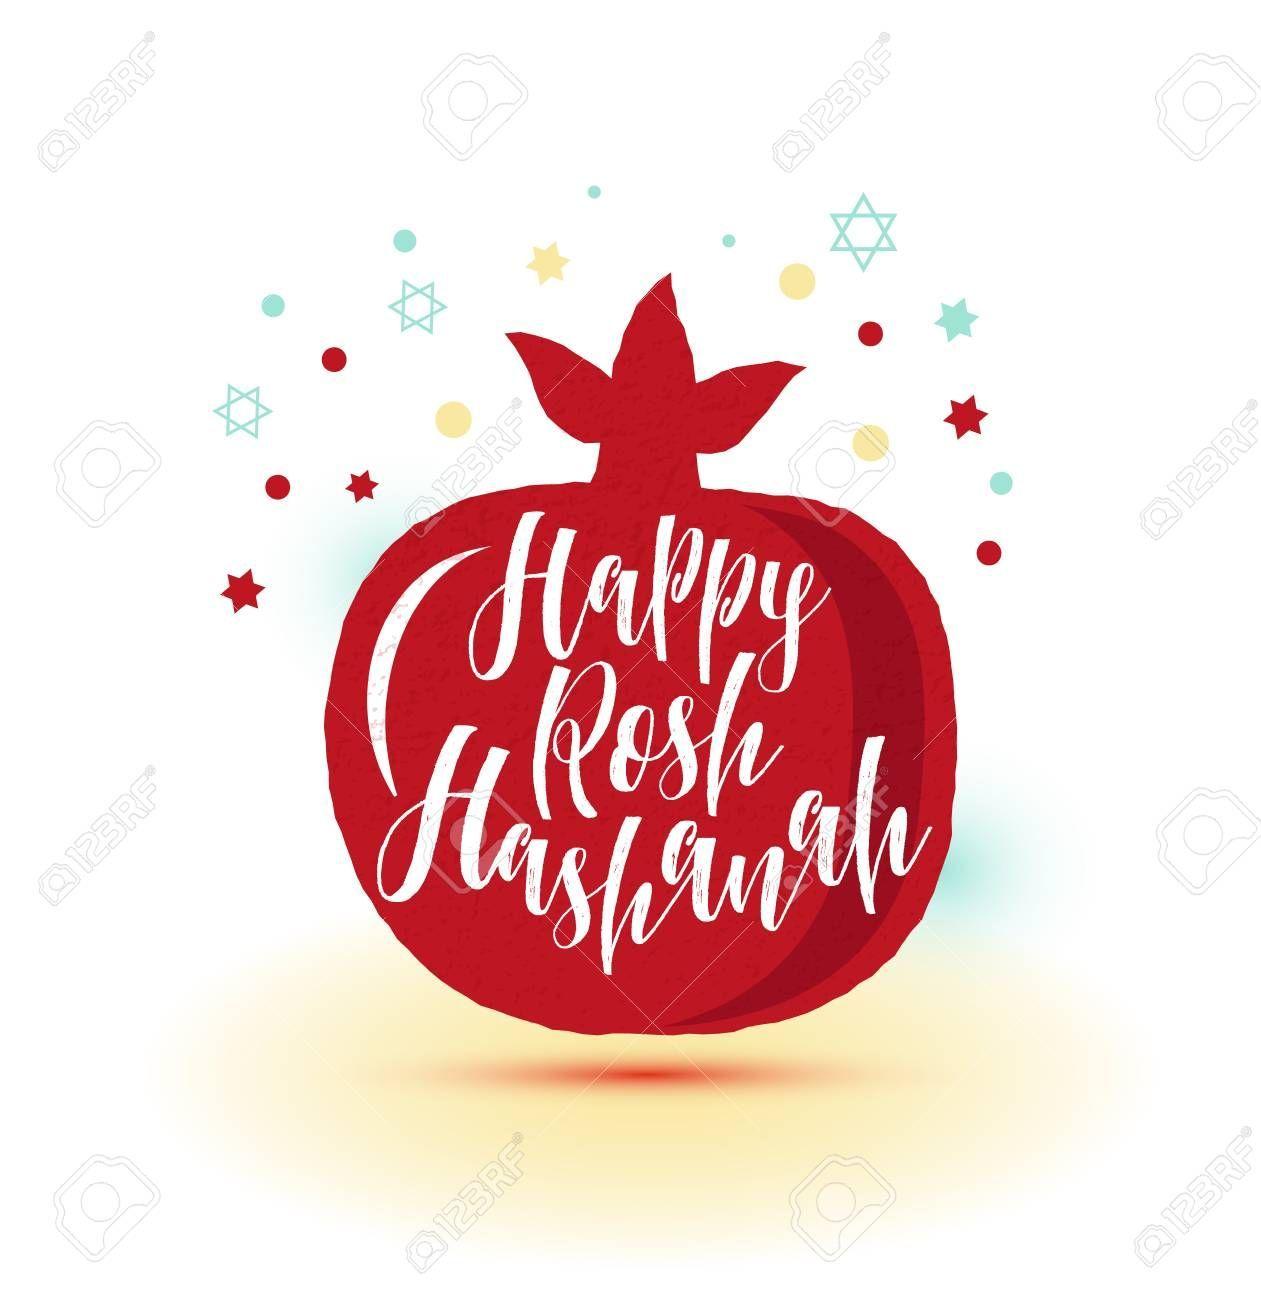 Greeting card wiyh symbol of Rosh Hashanah pomegranate . Jewish new year celebration design. Happy Shana Tova. Happy New Year in Hebrew Illustration , #sponsored, #Hashanah, #Rosh, #Jewish, #pomegranate, #card #shanatovacards Greeting card wiyh symbol of Rosh Hashanah pomegranate . Jewish new year celebration design. Happy Shana Tova. Happy New Year in Hebrew Illustration , #sponsored, #Hashanah, #Rosh, #Jewish, #pomegranate, #card #happyroshhashanah